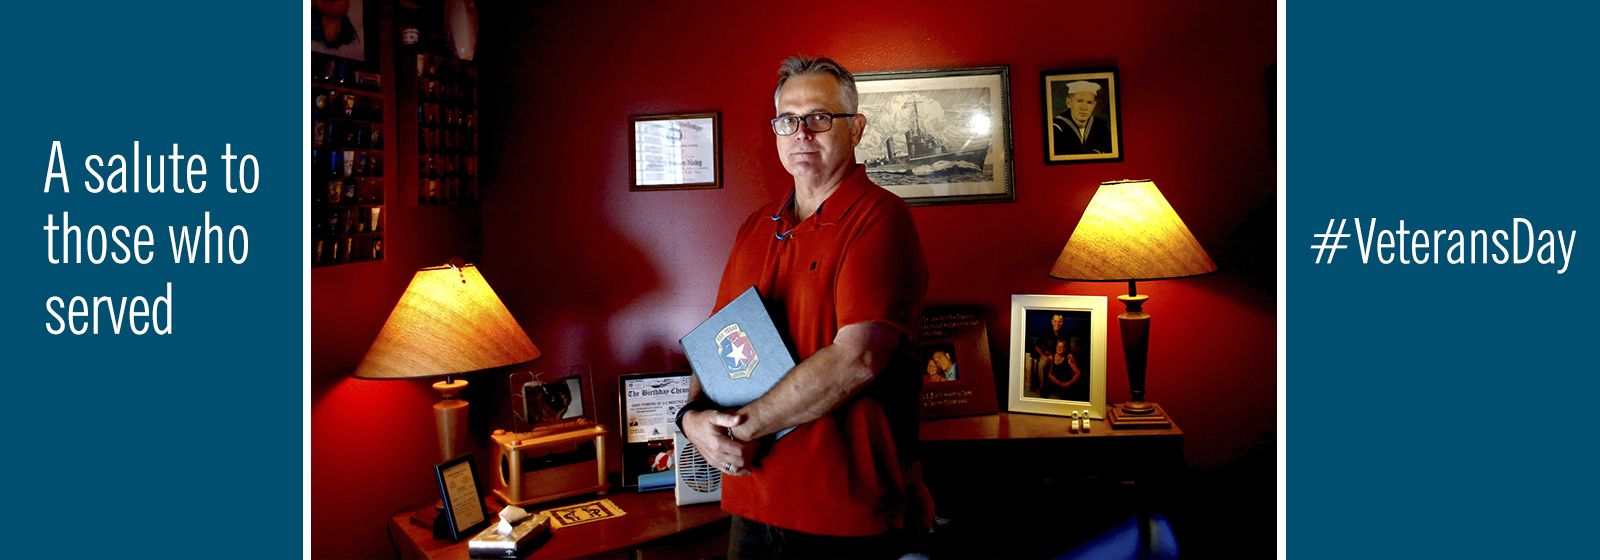 Meet Ben Bradberry: Navy strengthened father-son bond